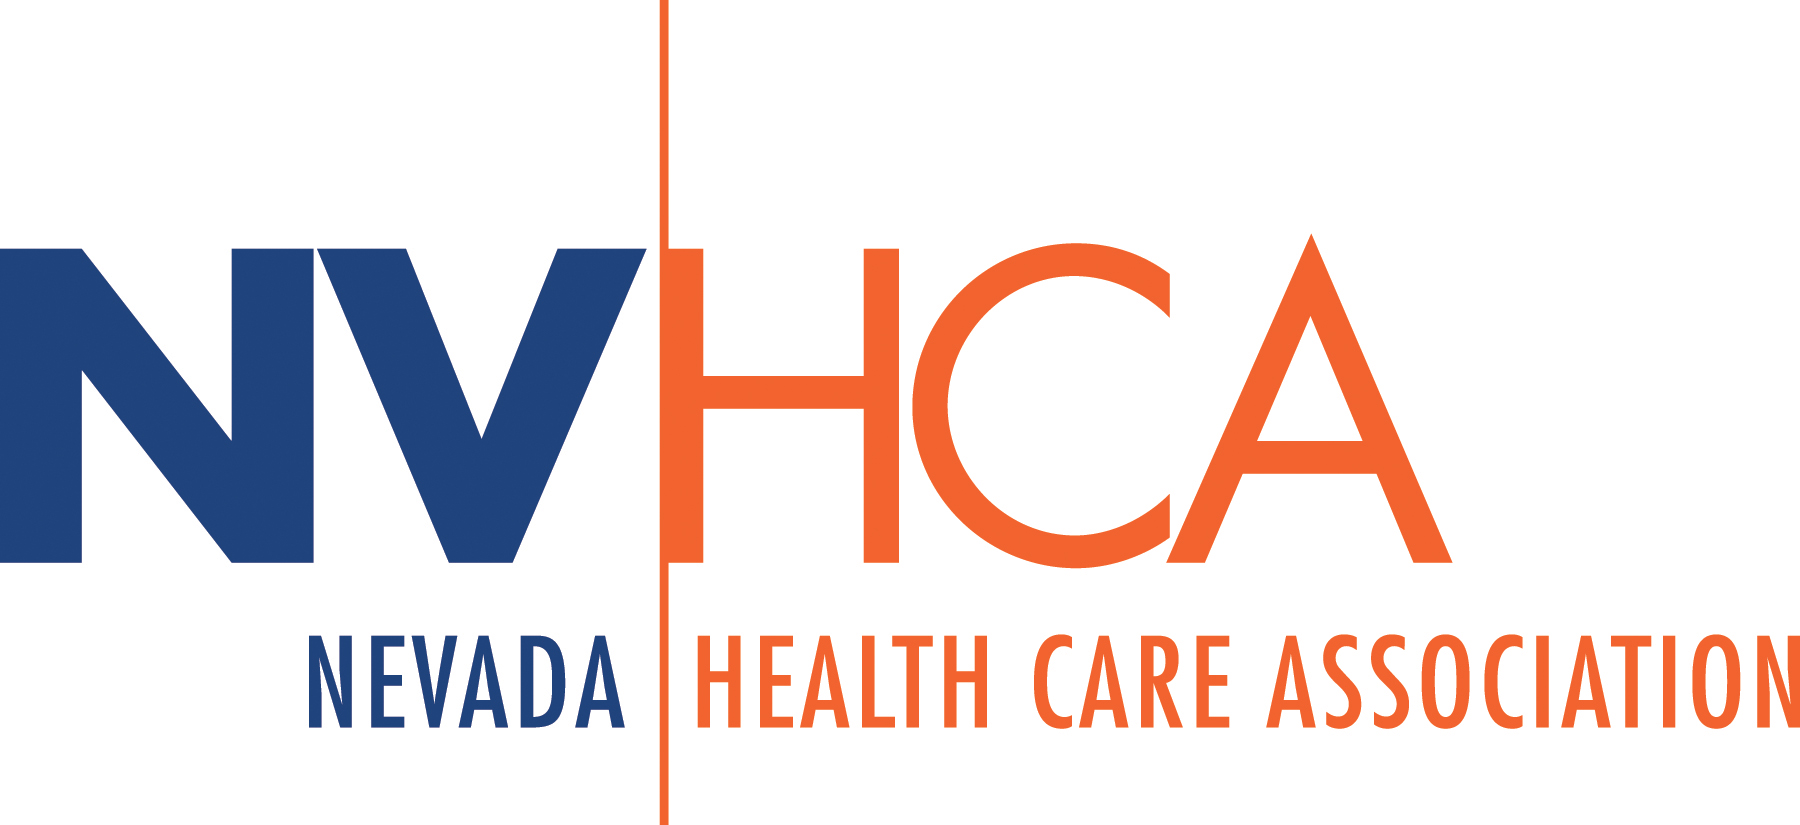 Nevada Healthcare Association